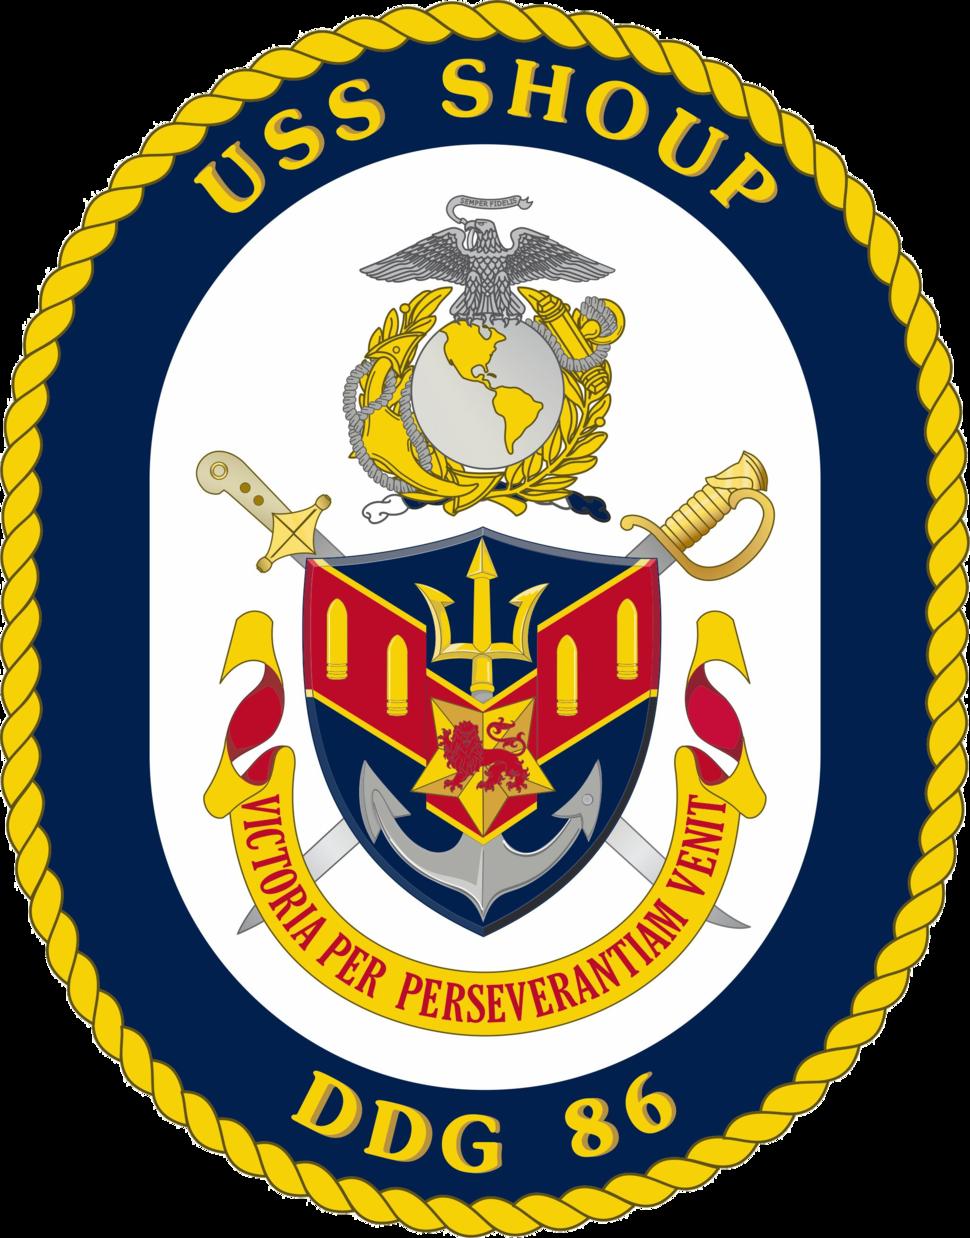 USS Shoup DDG-86 Crest